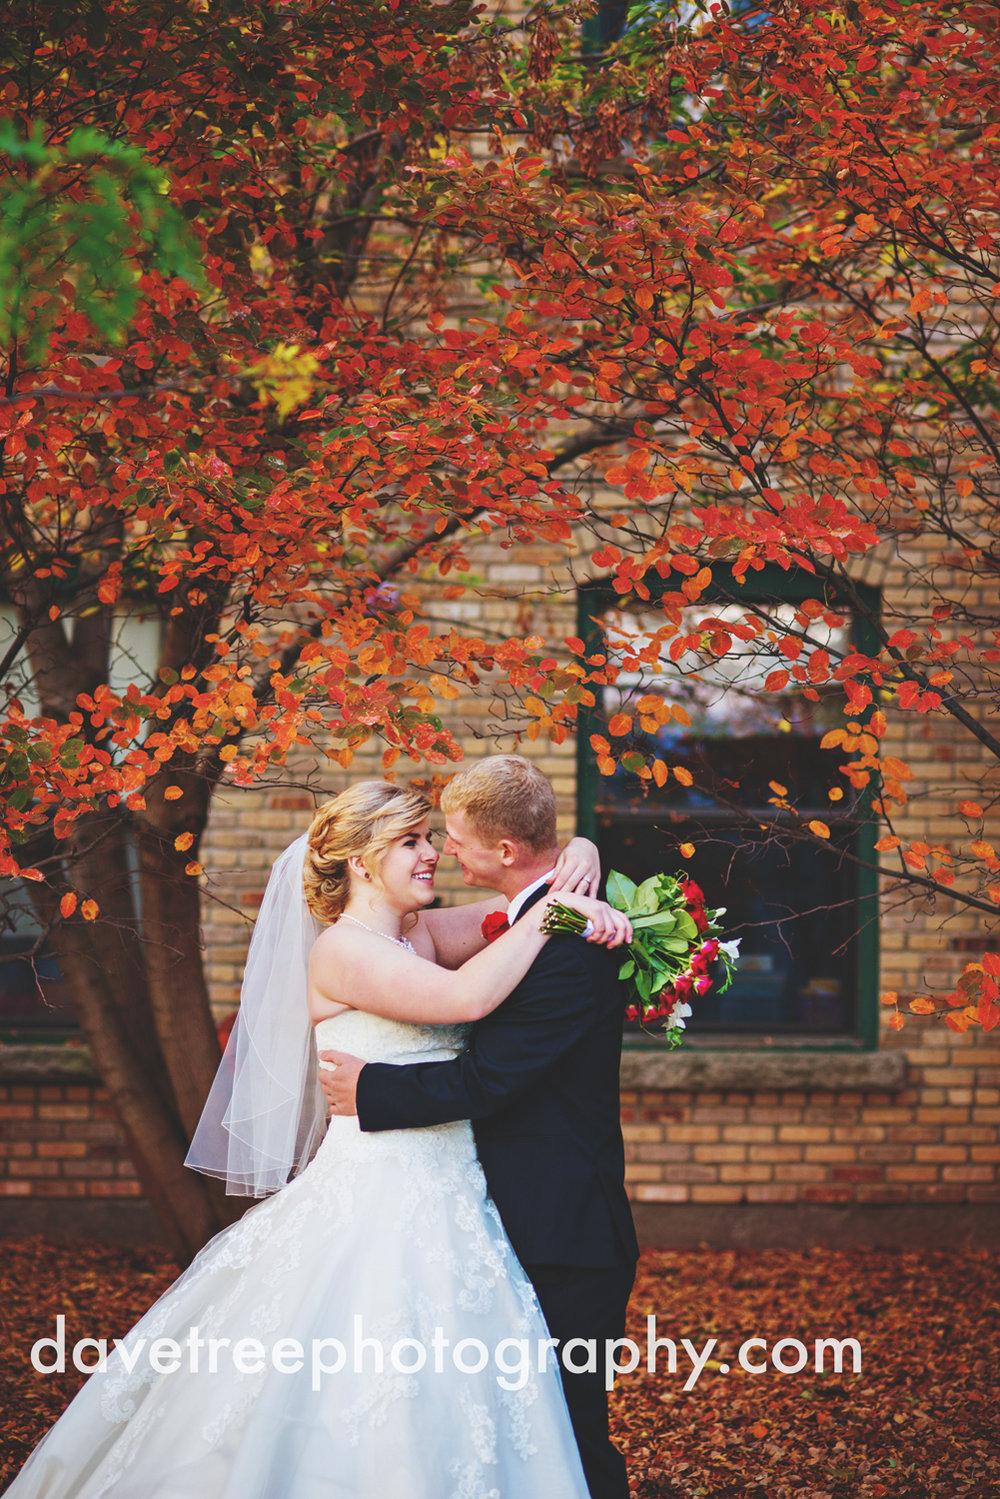 holland_wedding_photographer_26.jpg